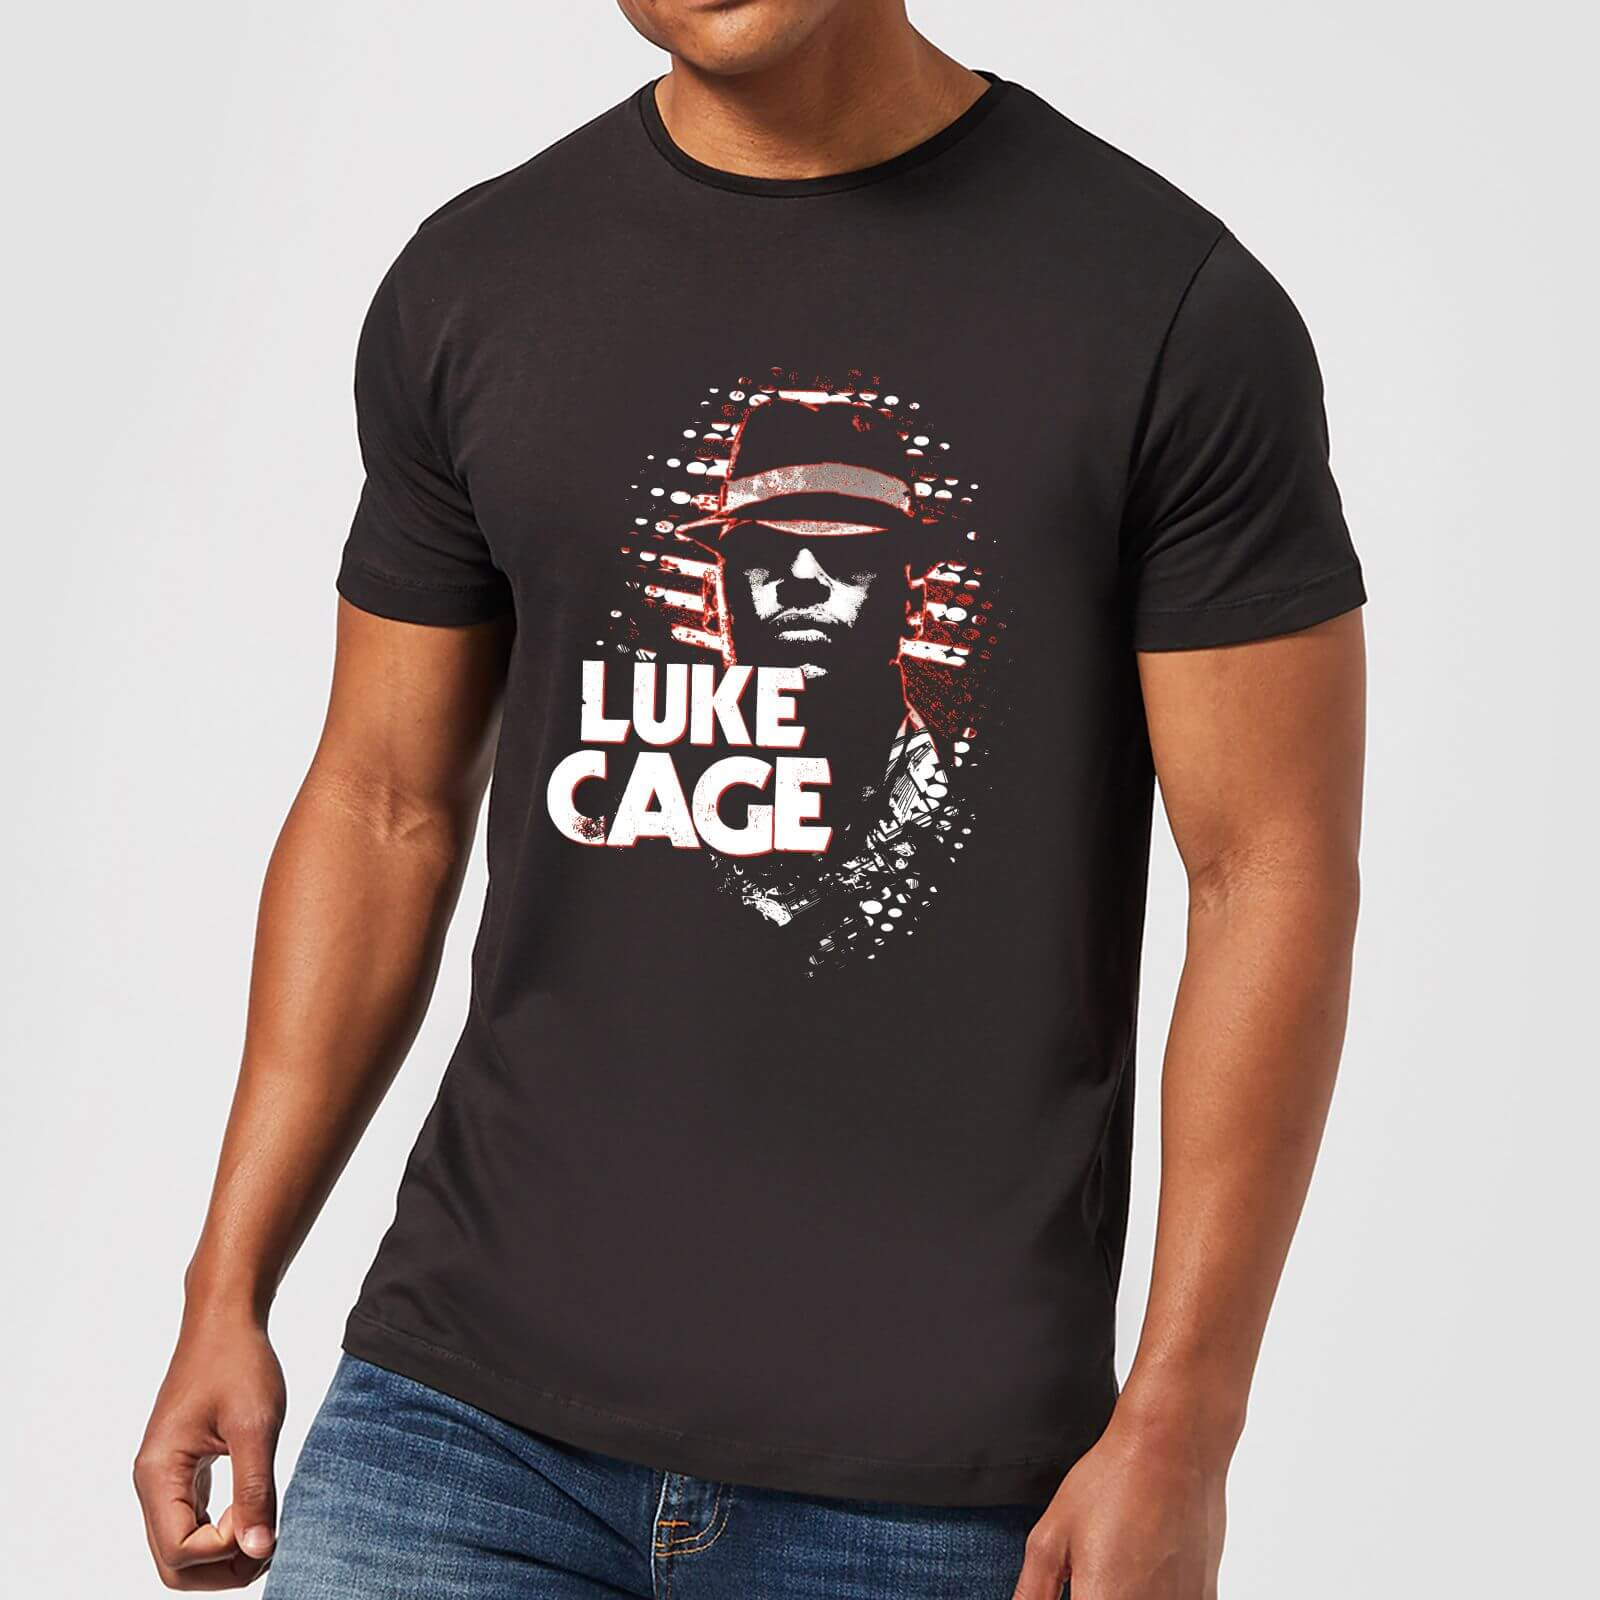 OfferteWeb.click 94-t-shirt-marvel-knights-luke-cage-nero-uomo-xl-nero